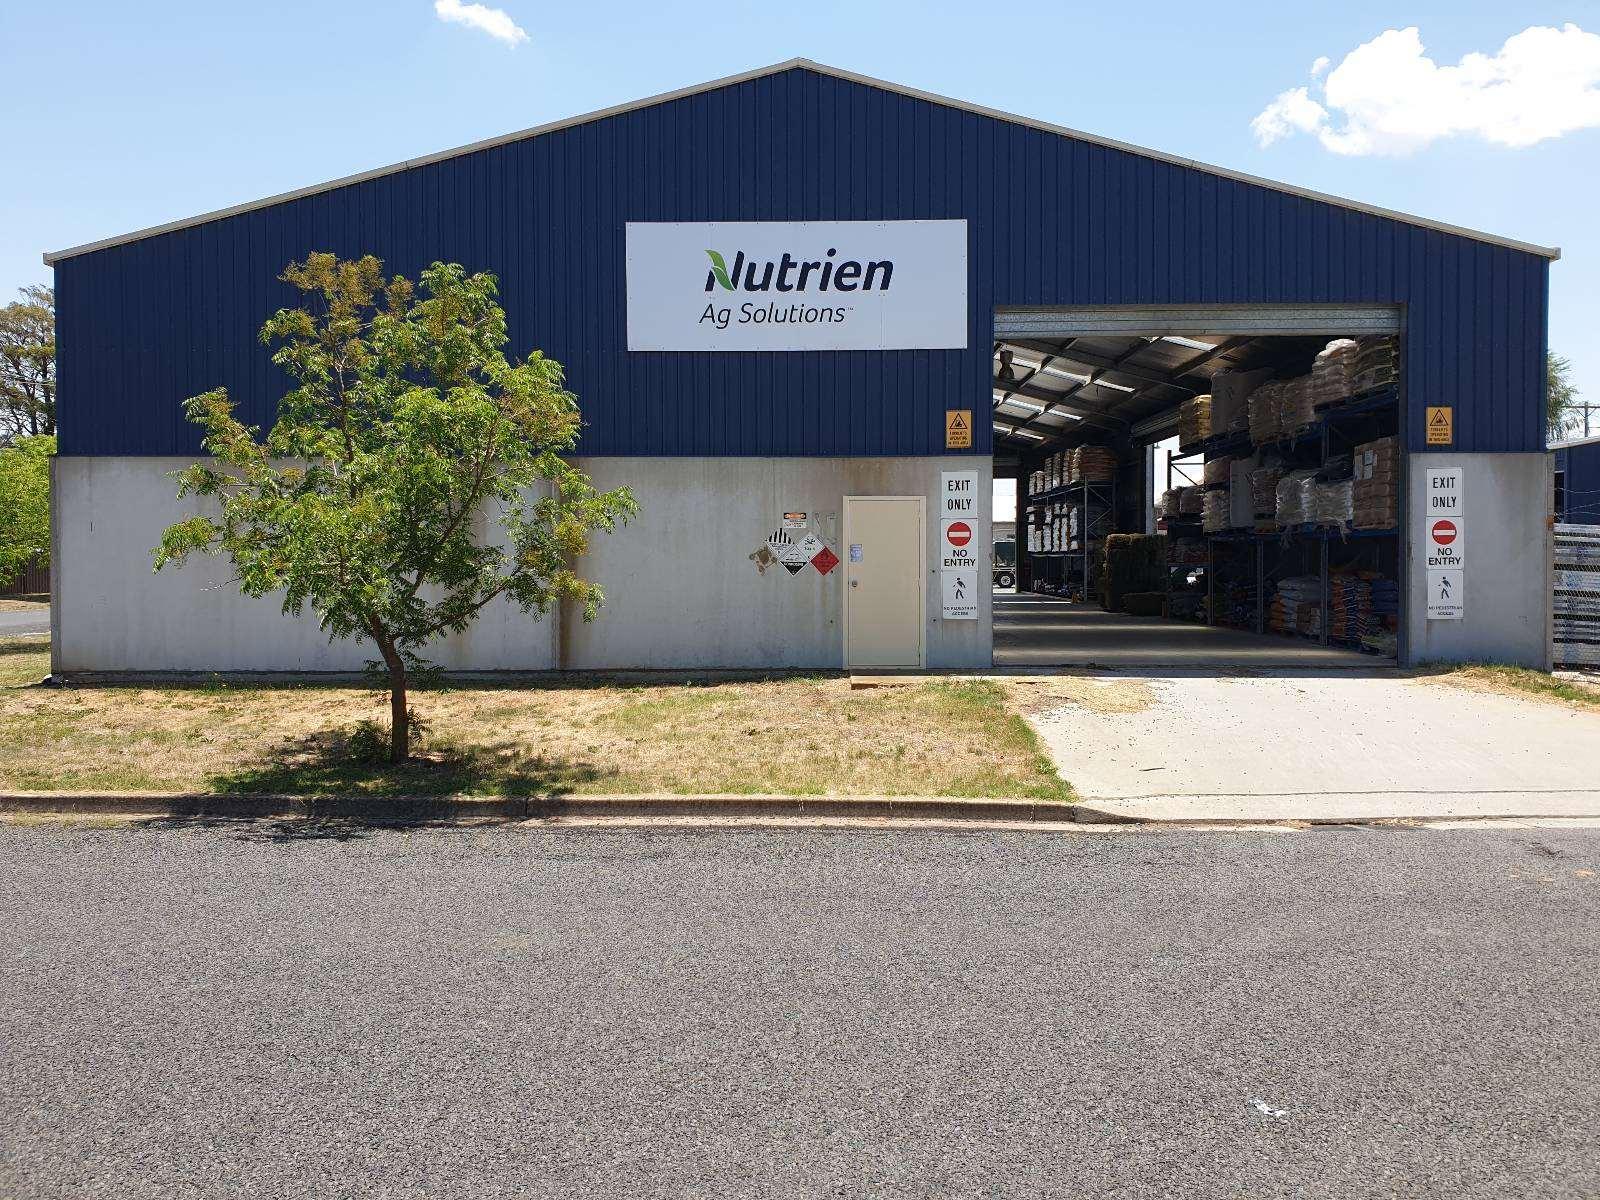 Nutrien Ag Solutions - Guyra, NSW 2365 - (02) 6779 1025 | ShowMeLocal.com